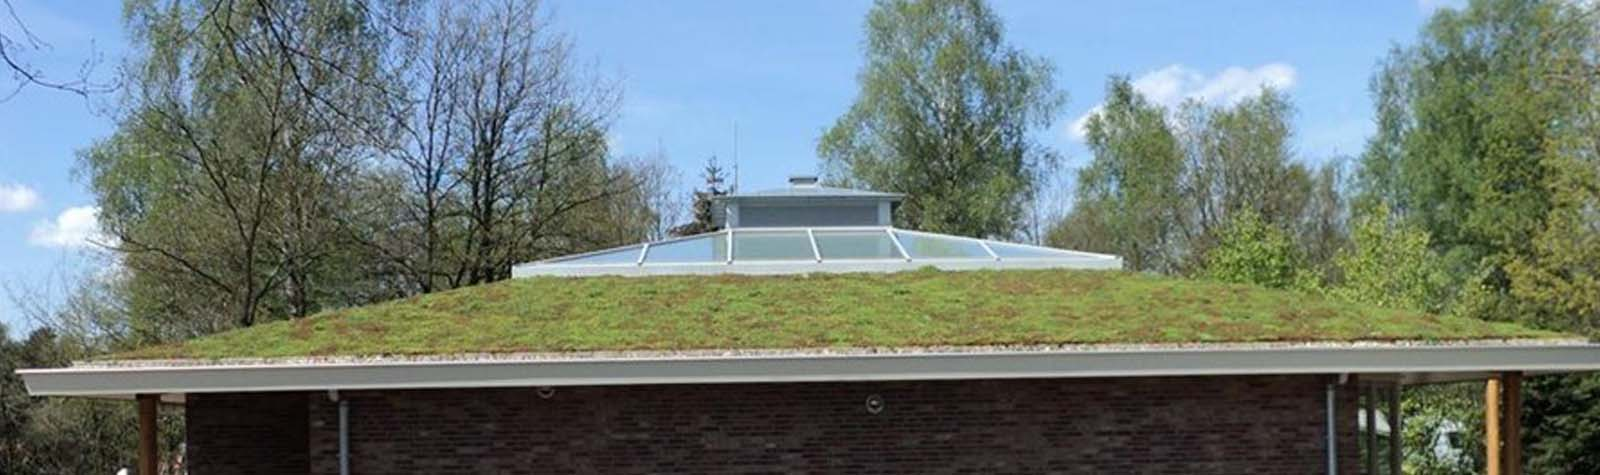 duurzaam-bouwen-groene-daken